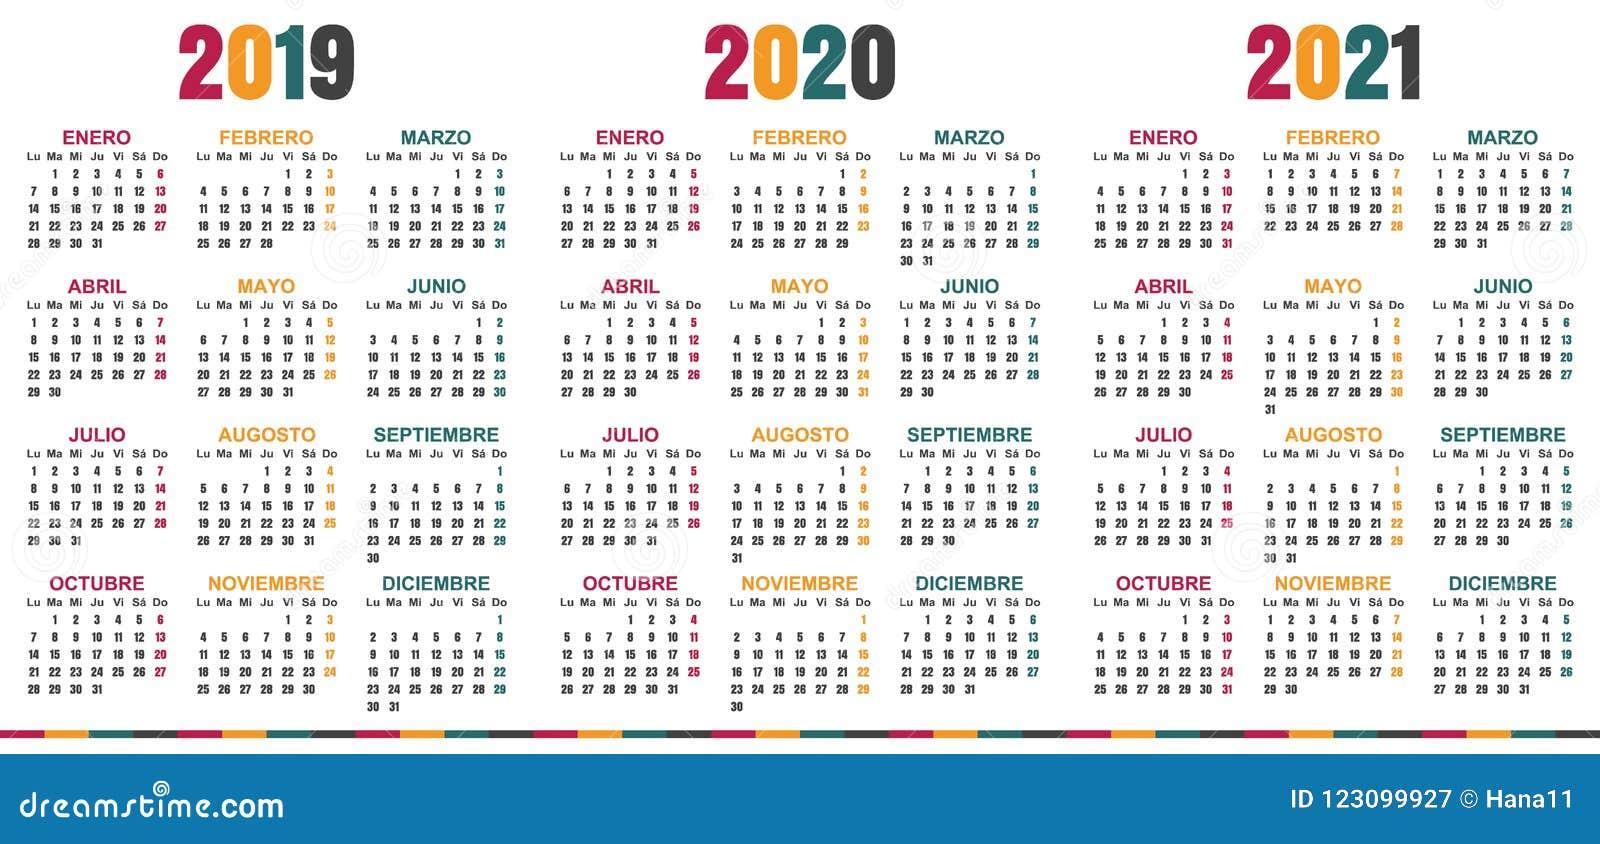 Spanish Calendar 2019 2021 Stock Vector Illustration Of 2021